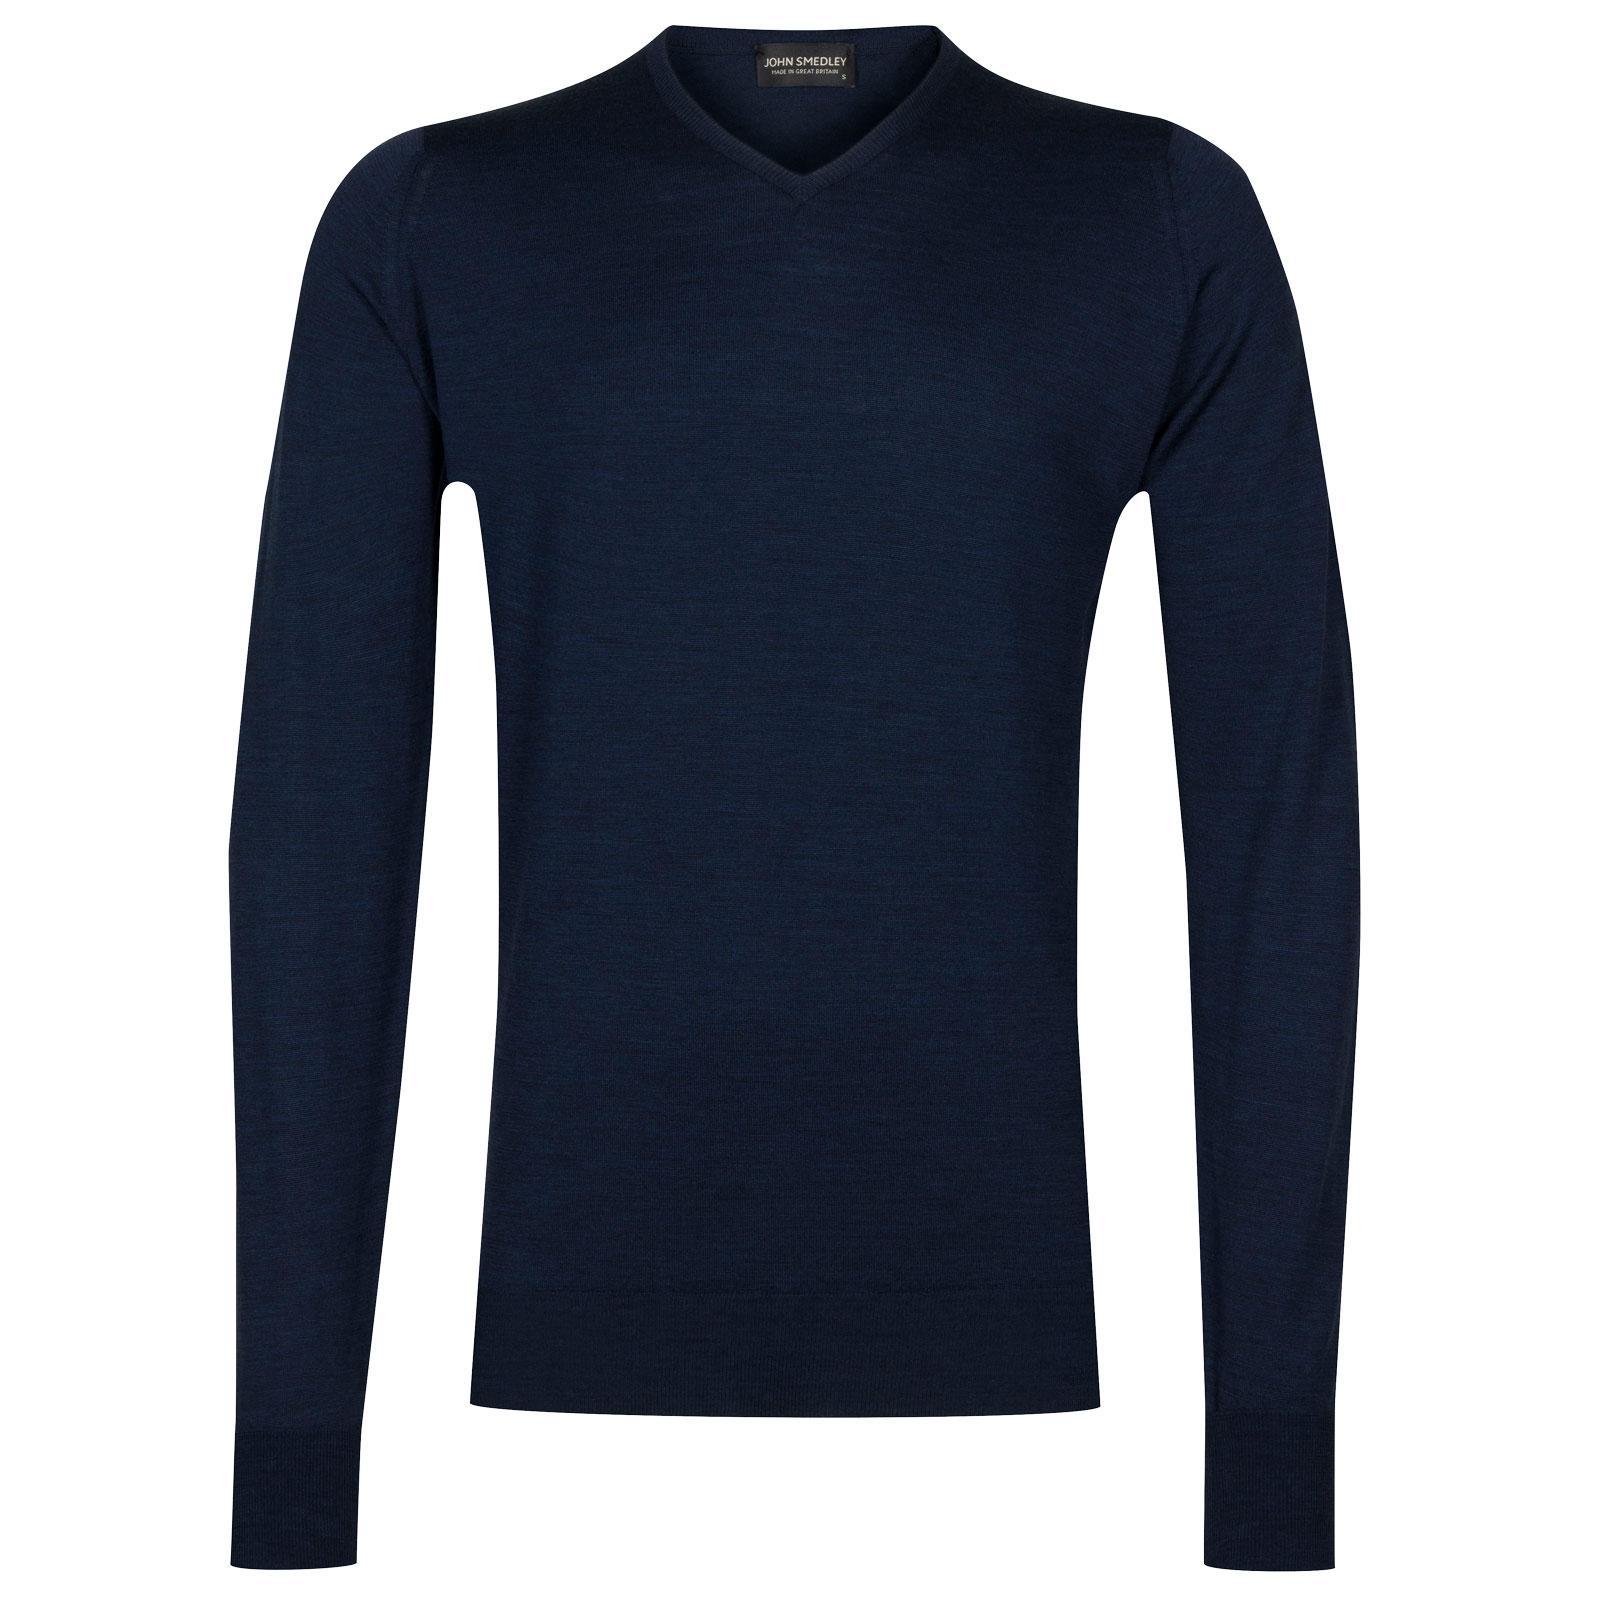 John Smedley shipton Merino Wool Pullover in Indigo-S